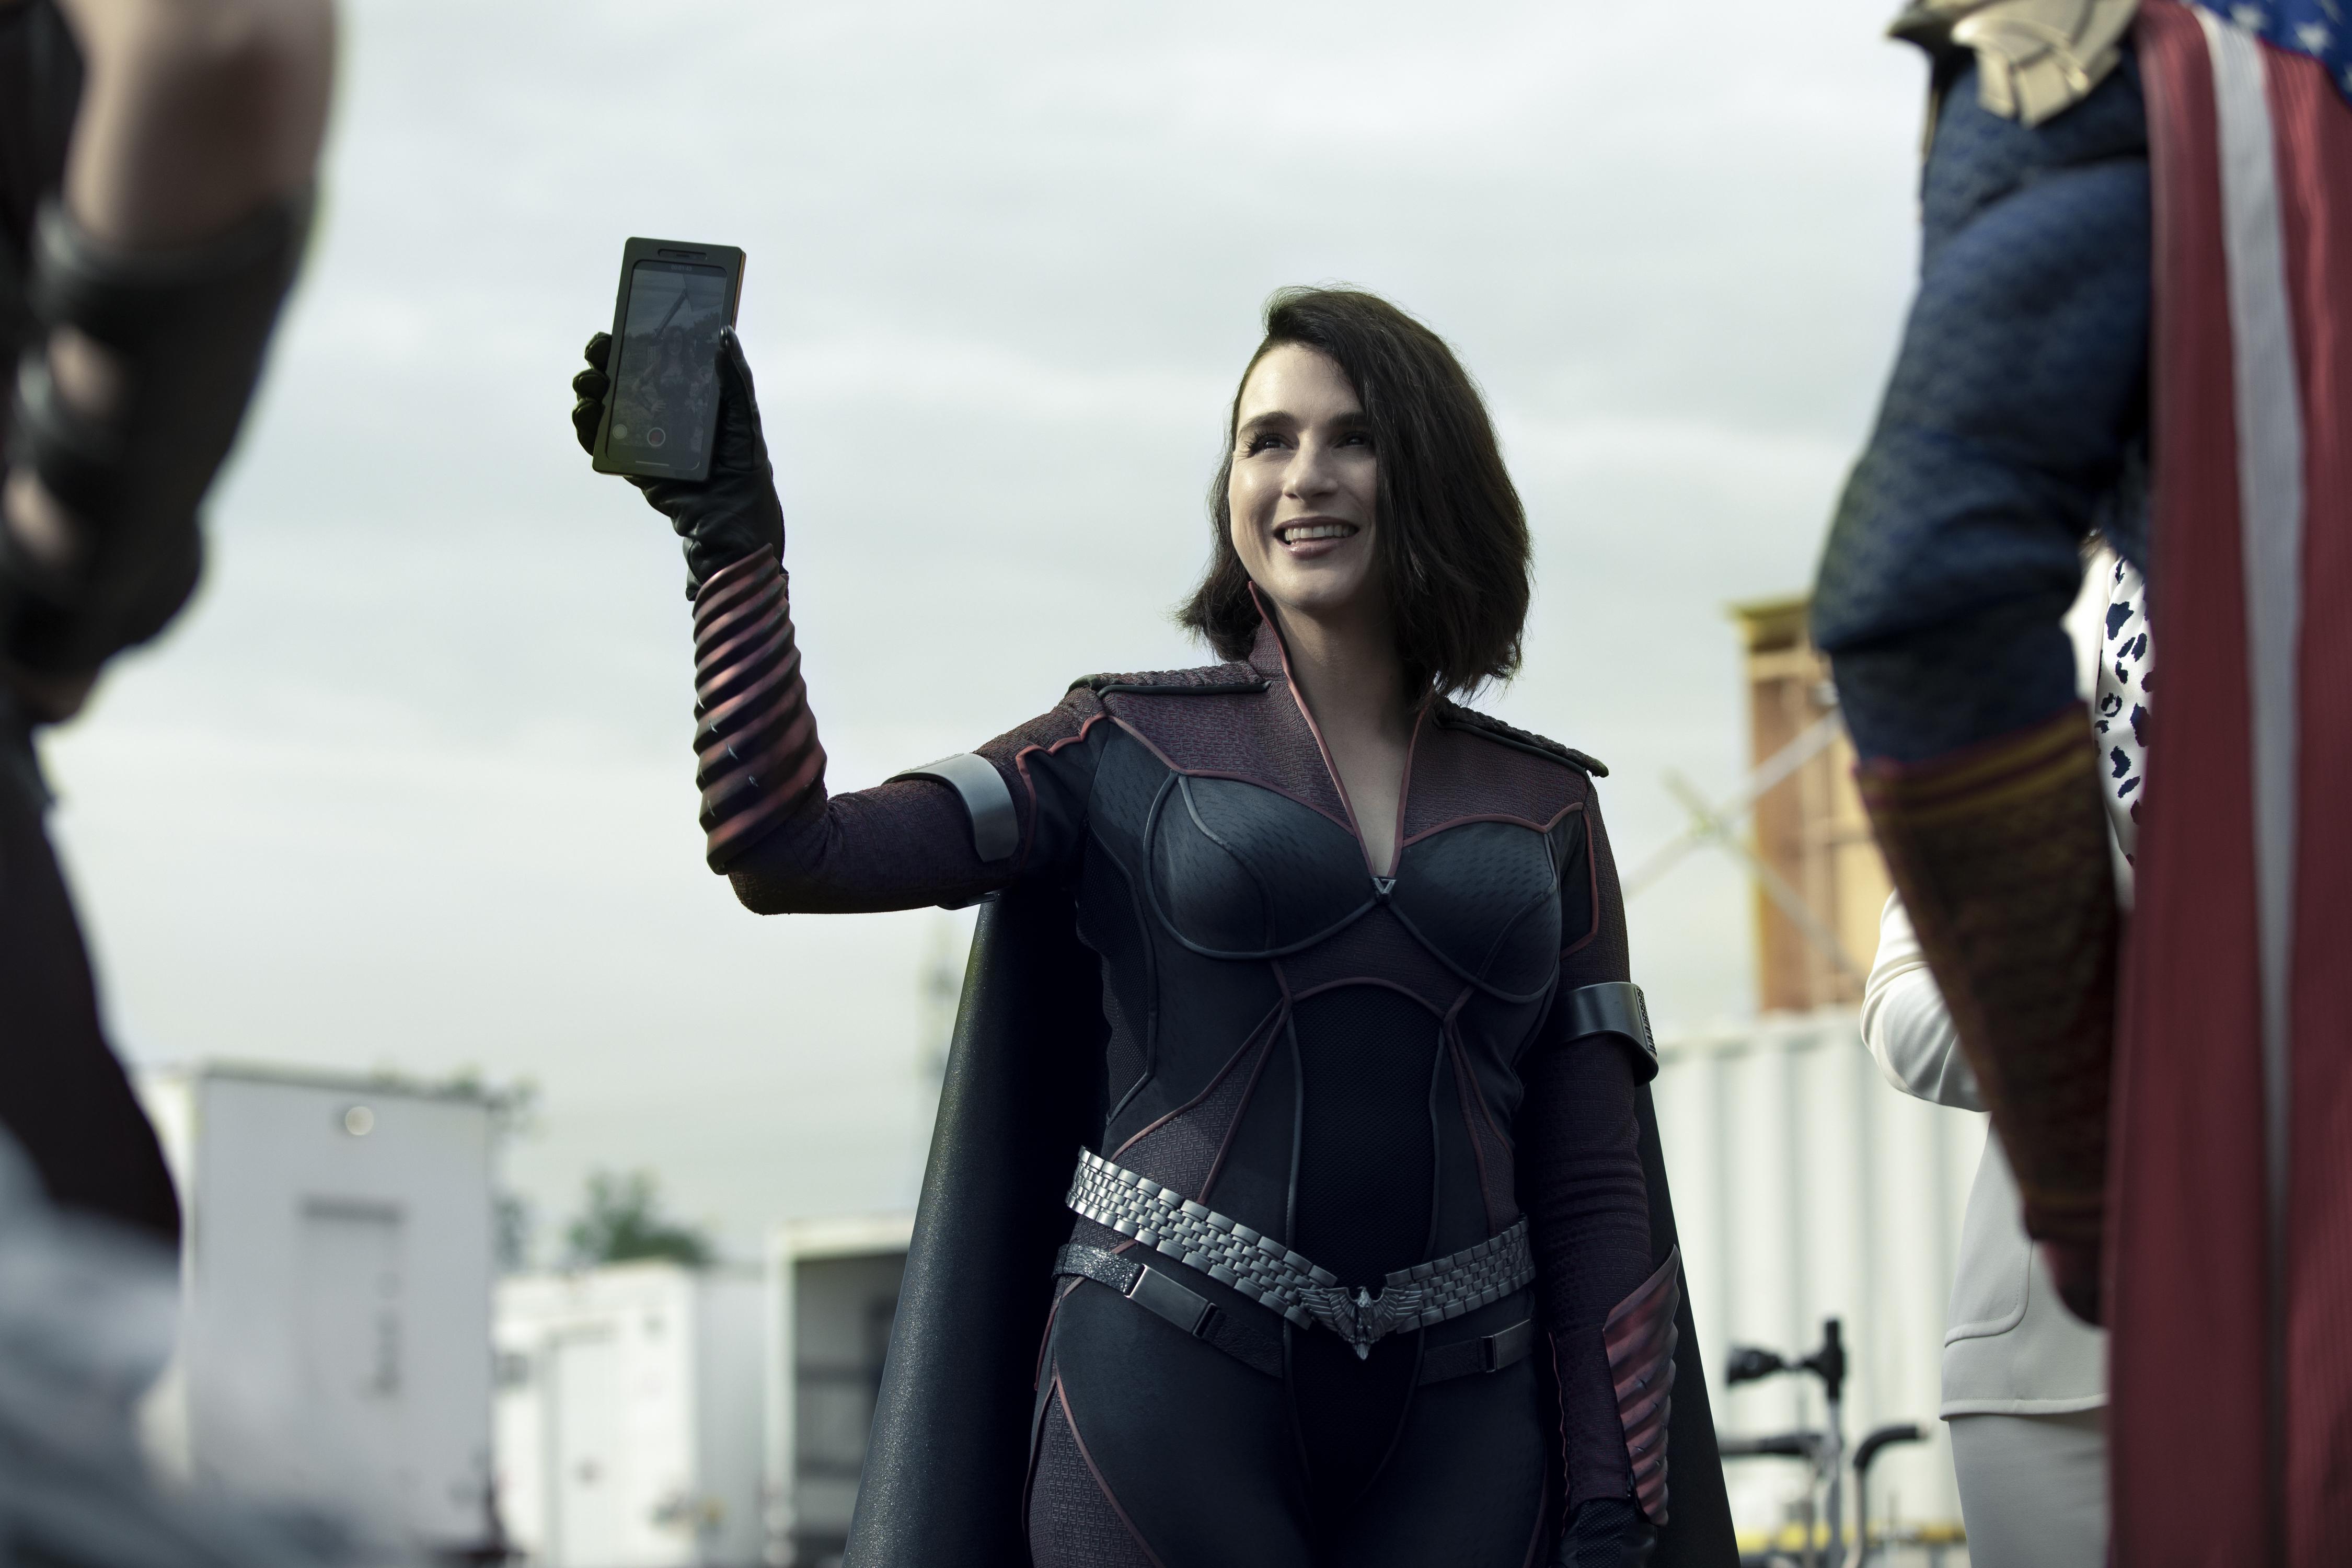 Stormfront holds up her social media phone on The Boys season 2